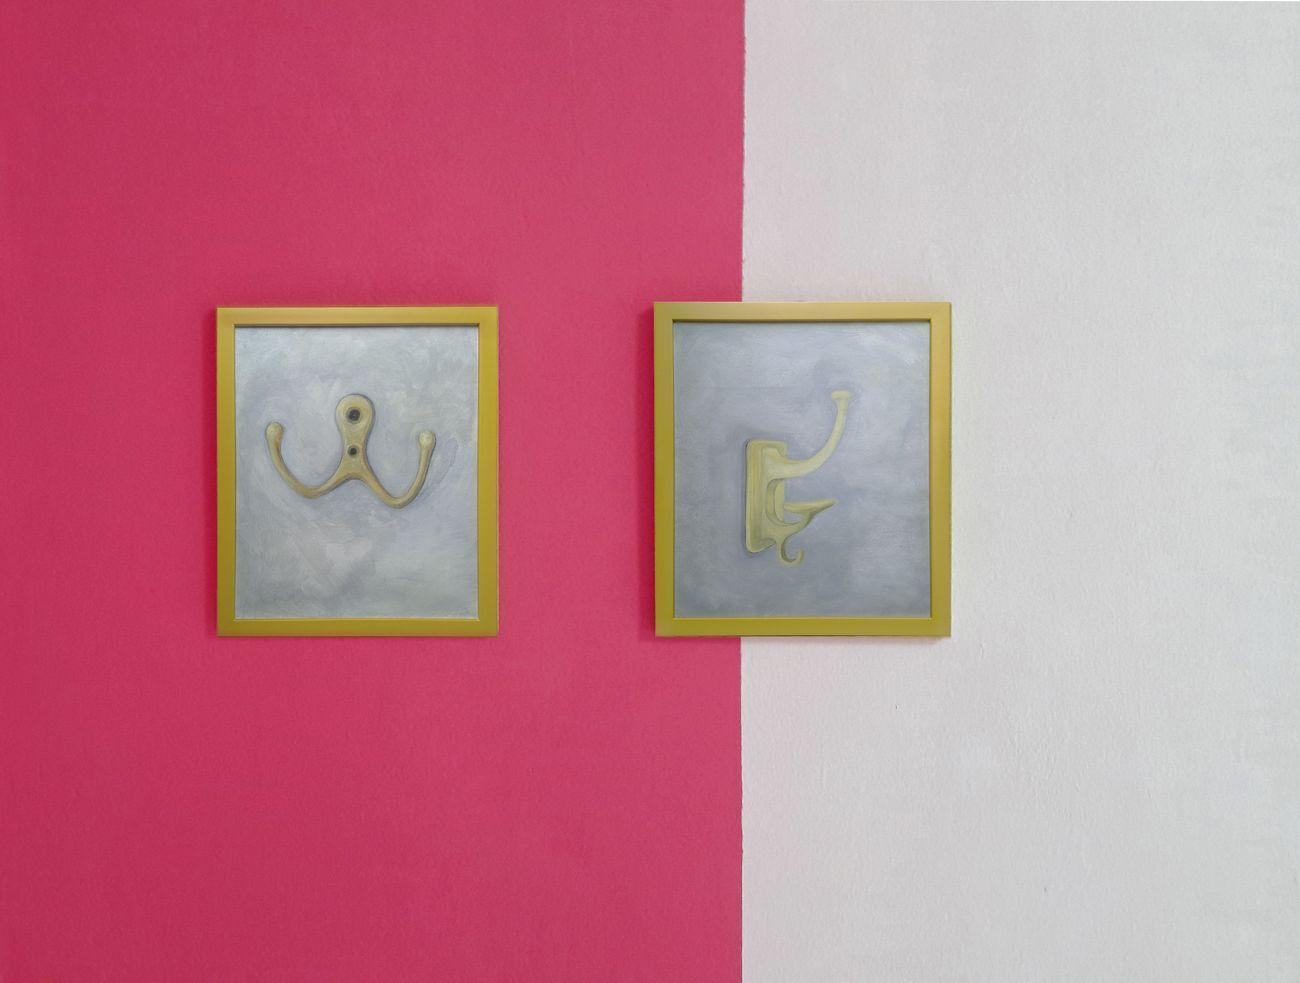 Alessandra Mancini, Matchy Matchy, 2017. Olio su tela, dittico, 30 x 25 cm ognuno